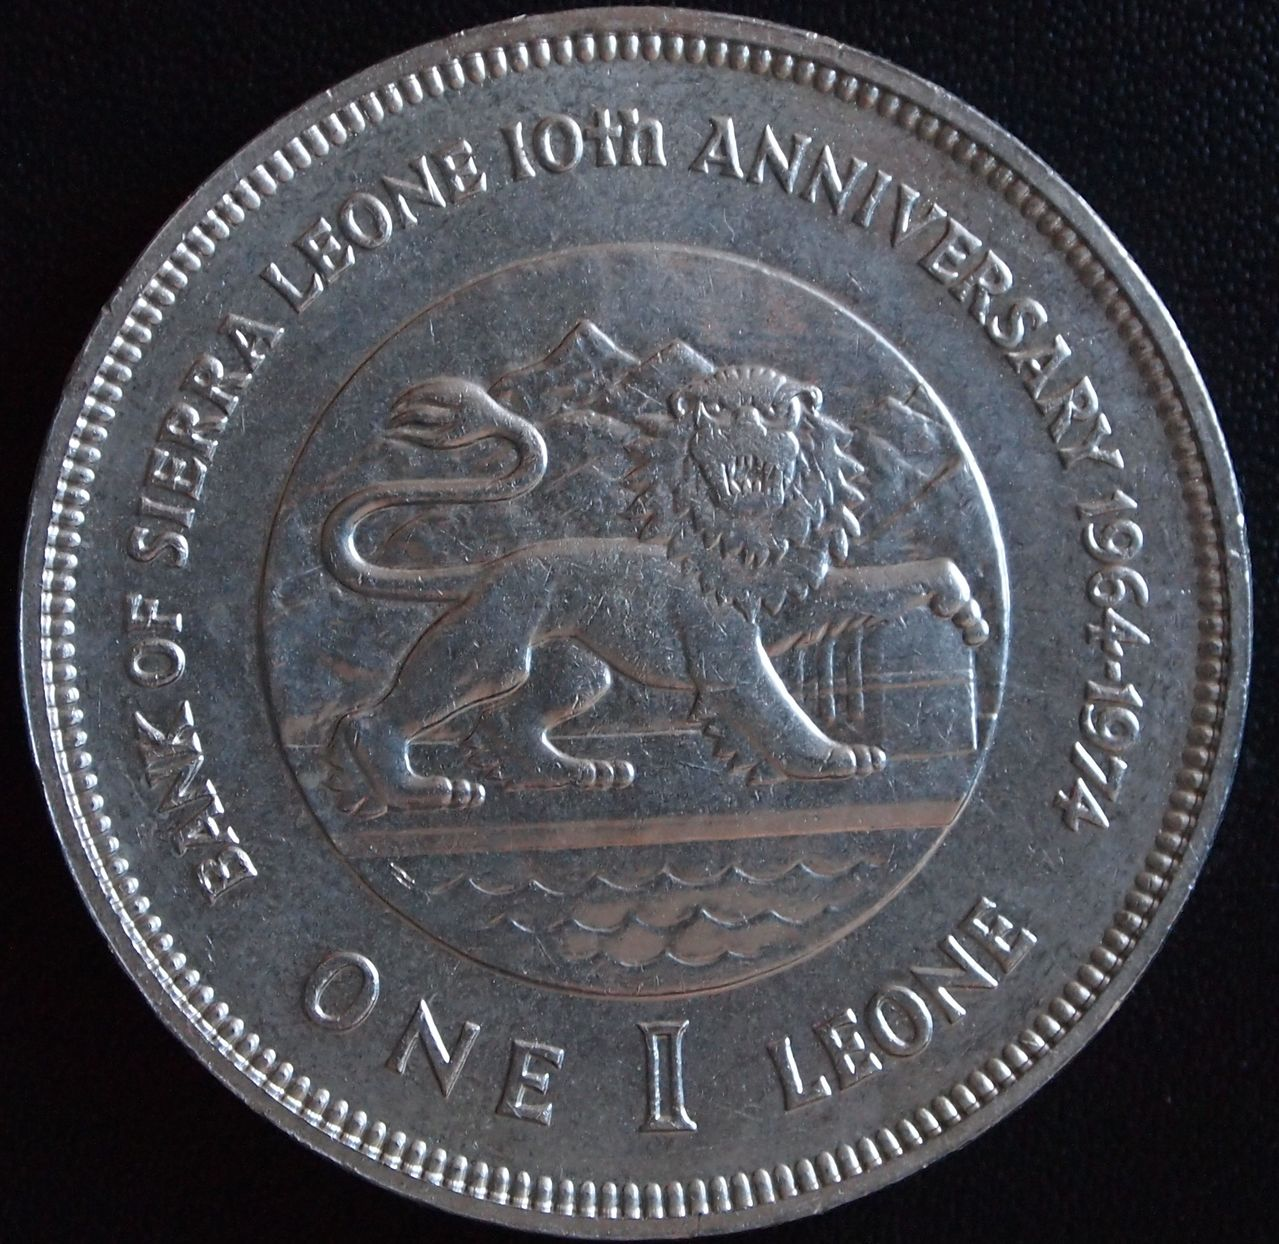 1 leone sierra leona 1974 2